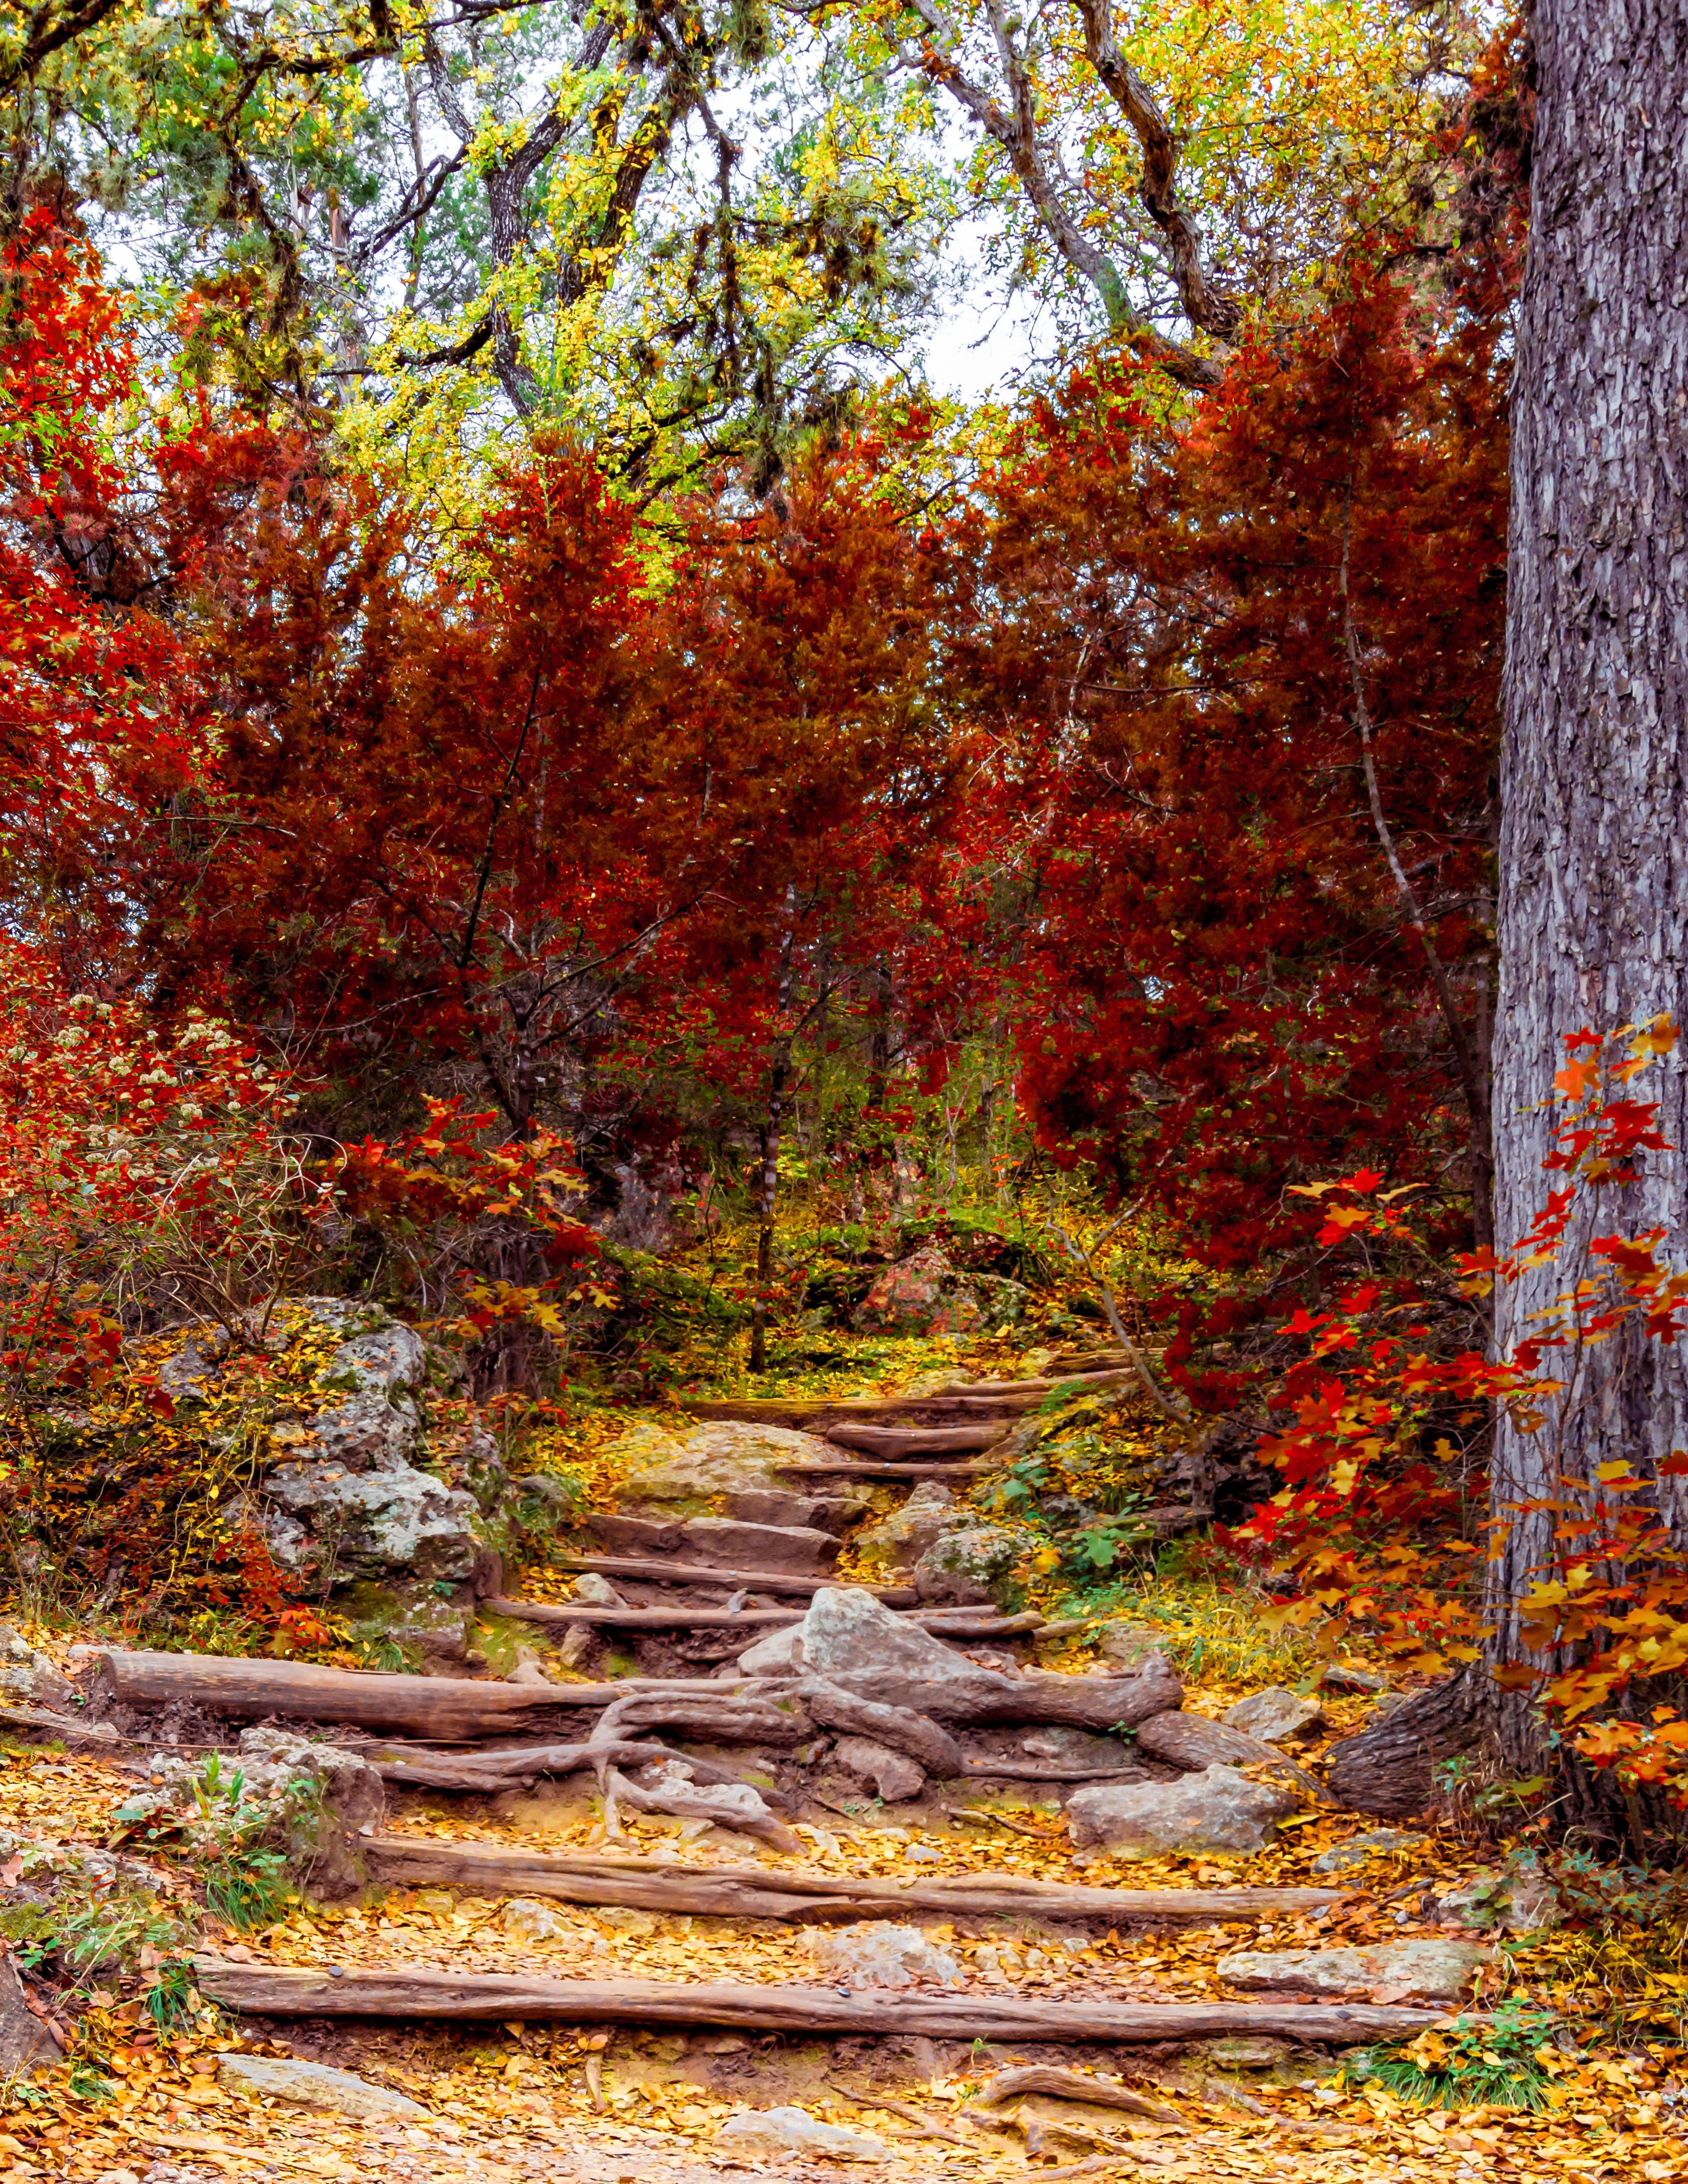 Free stock photo of autumn, autumn leaf, autumn mood forest, blurred background